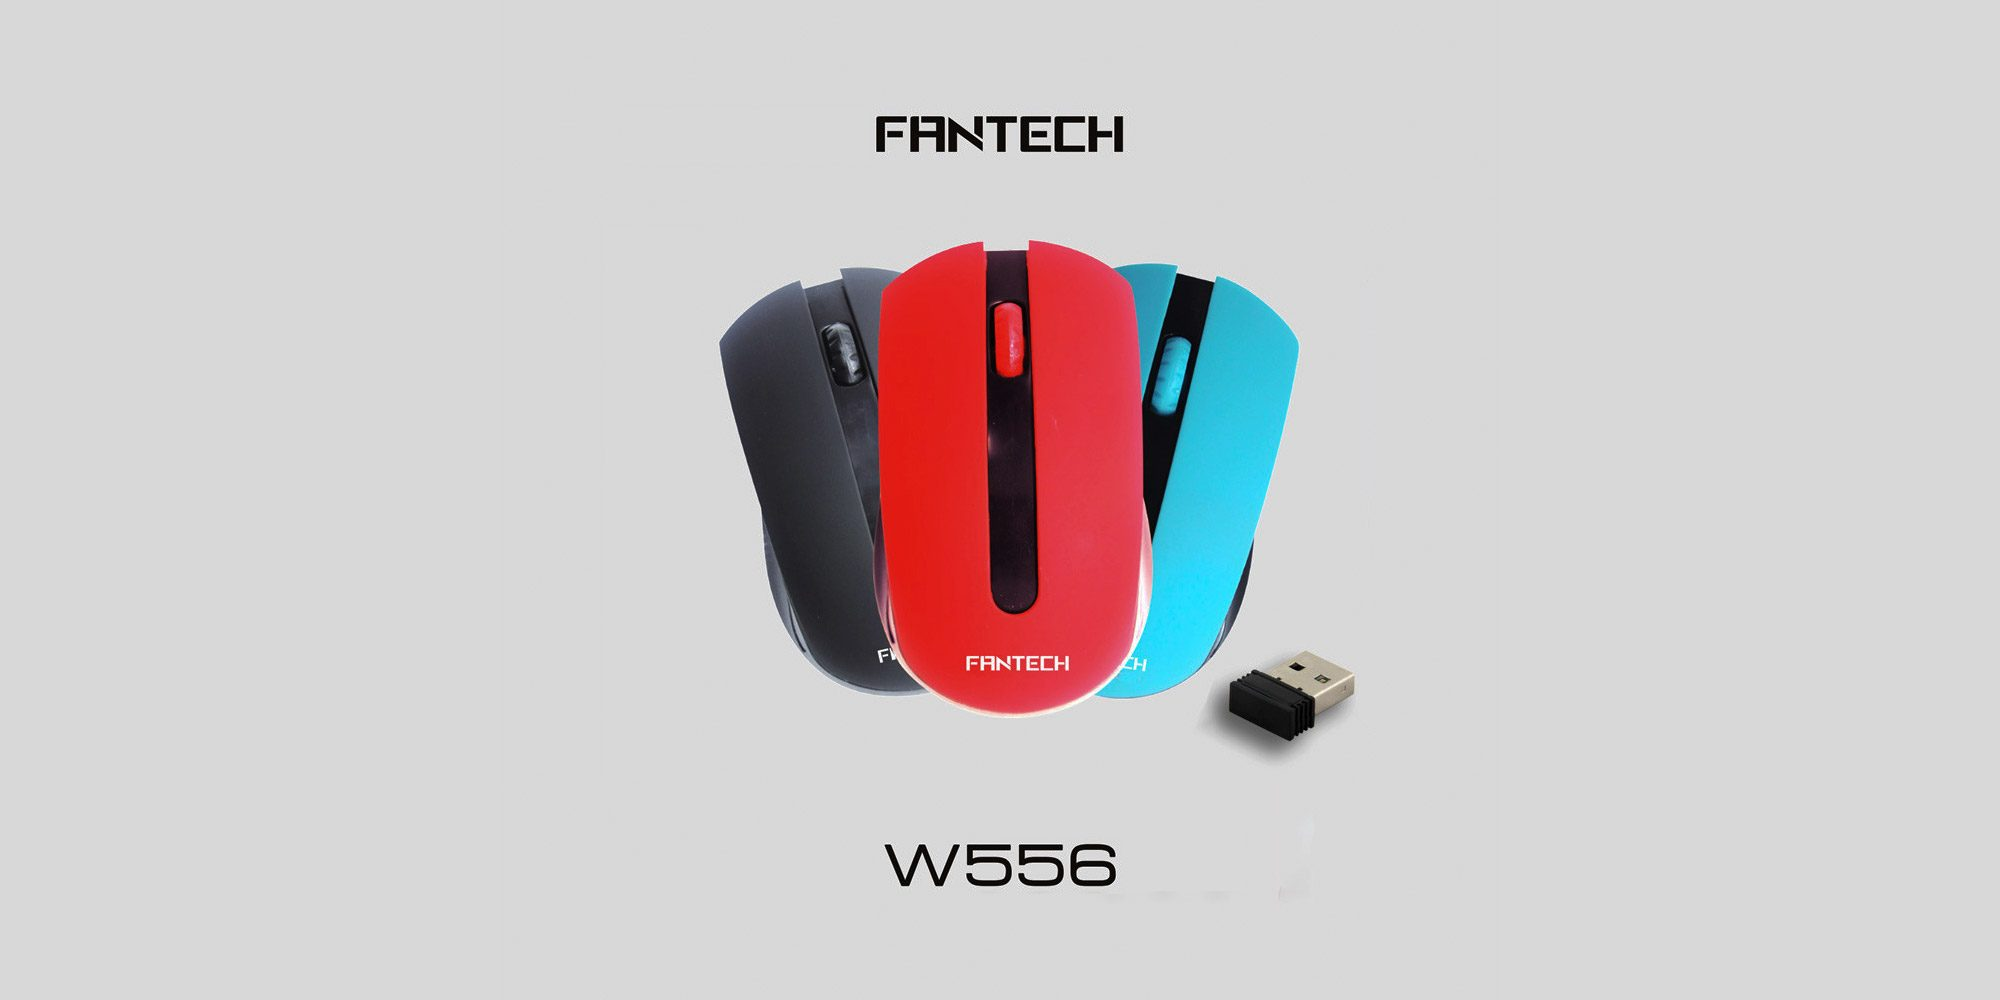 Мышь Fantech W556 Wireless